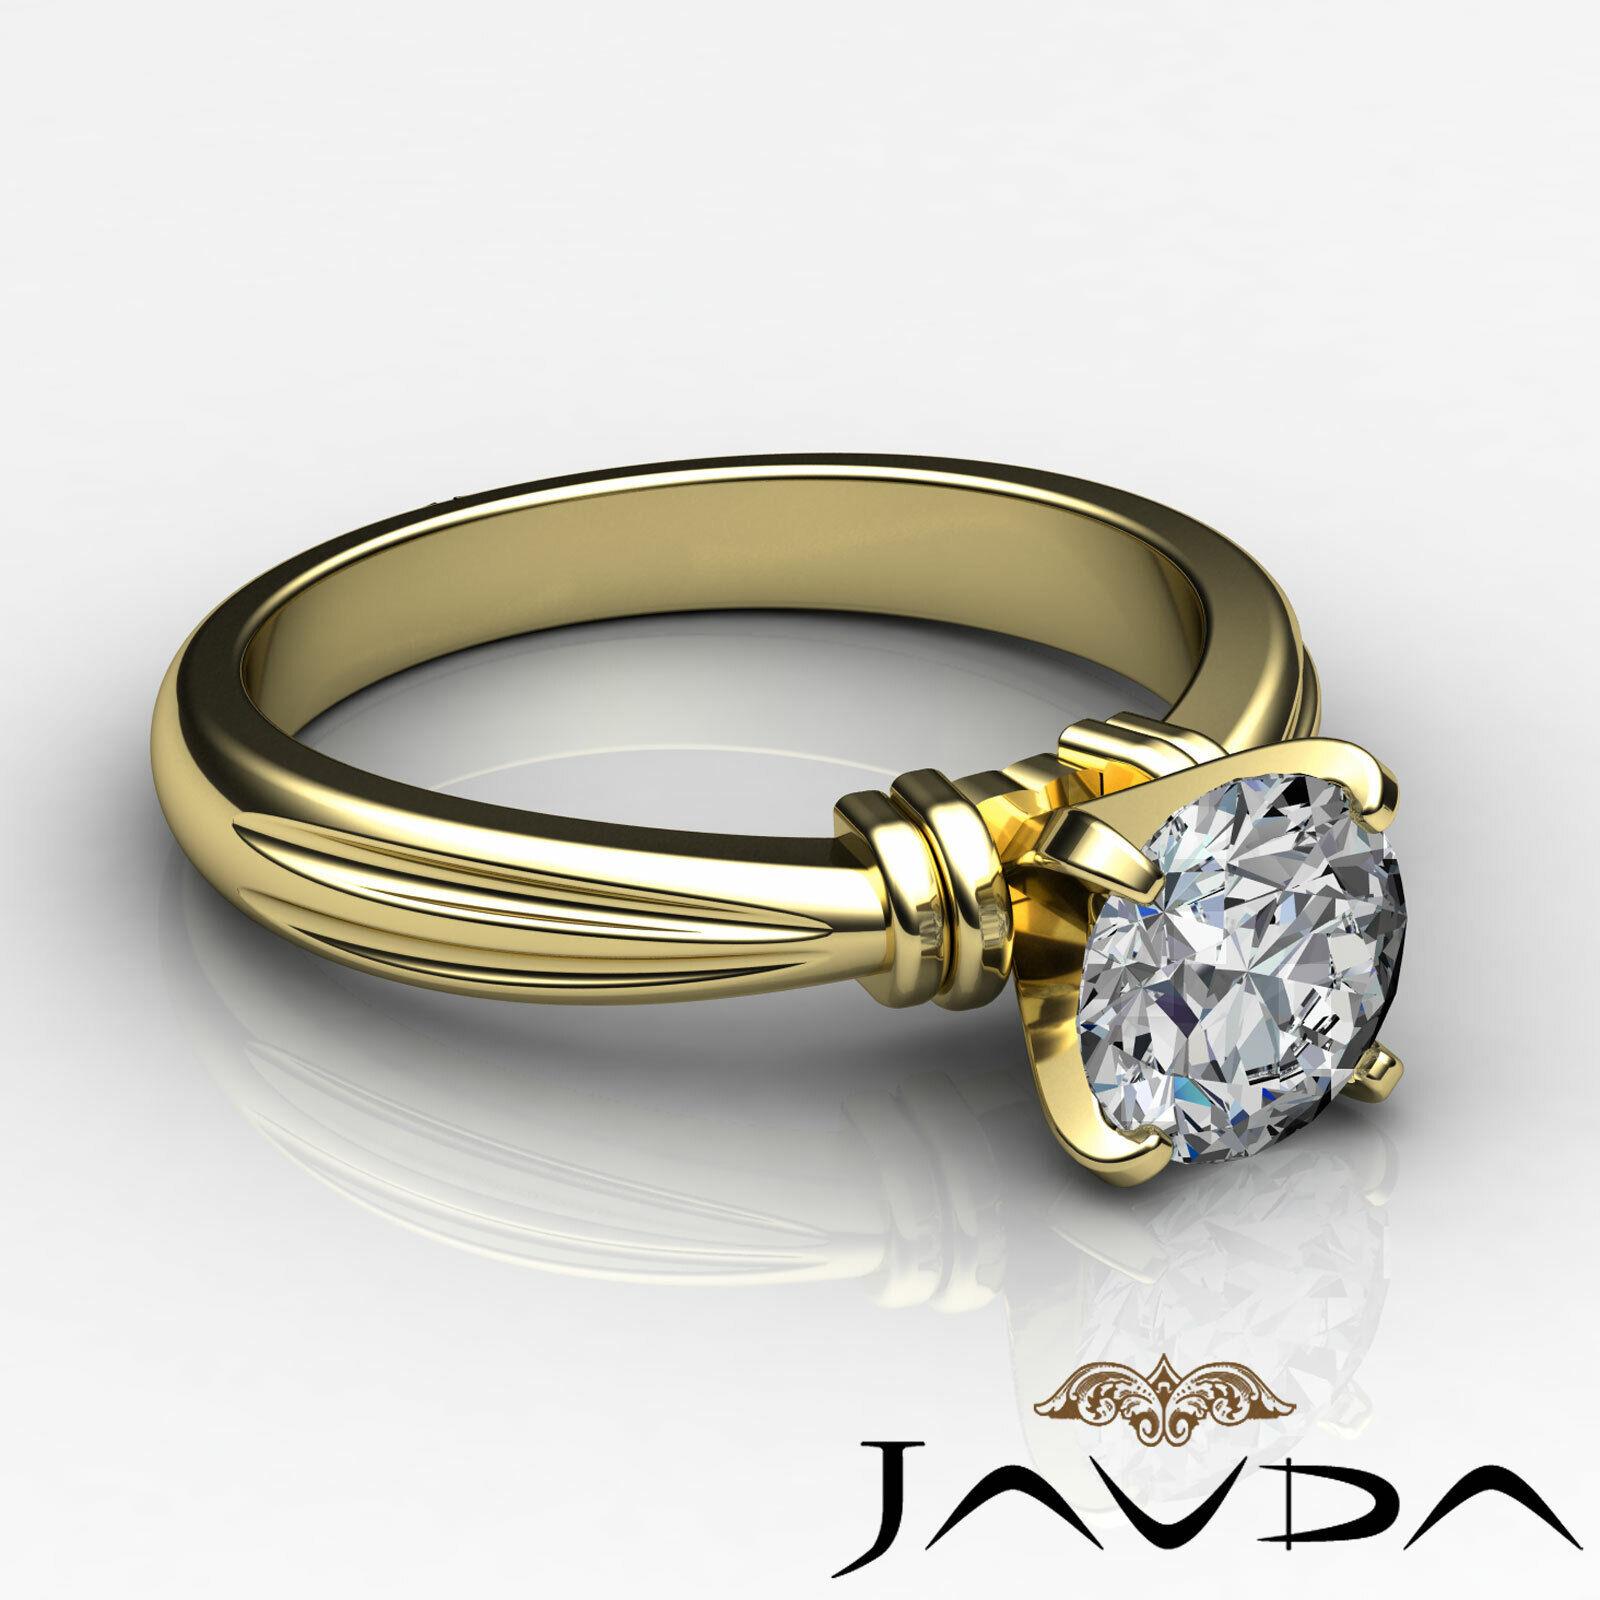 Round Solitaire Natural GIA H Color VVS2 Diamond Women's Engagement Ring 1 ctw. 5